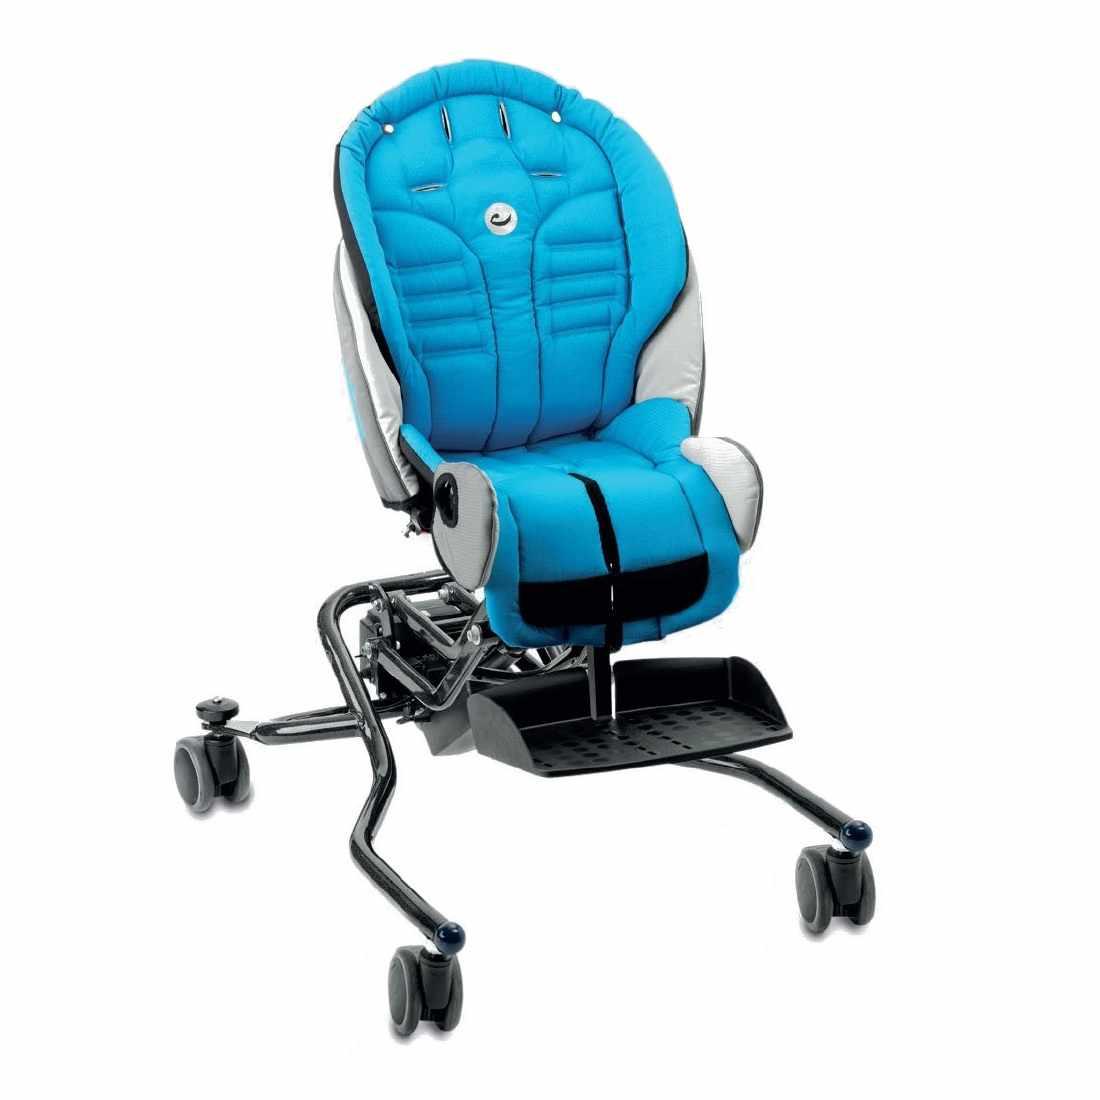 R82 Stingray tilt seating system with high-low indoor frame base